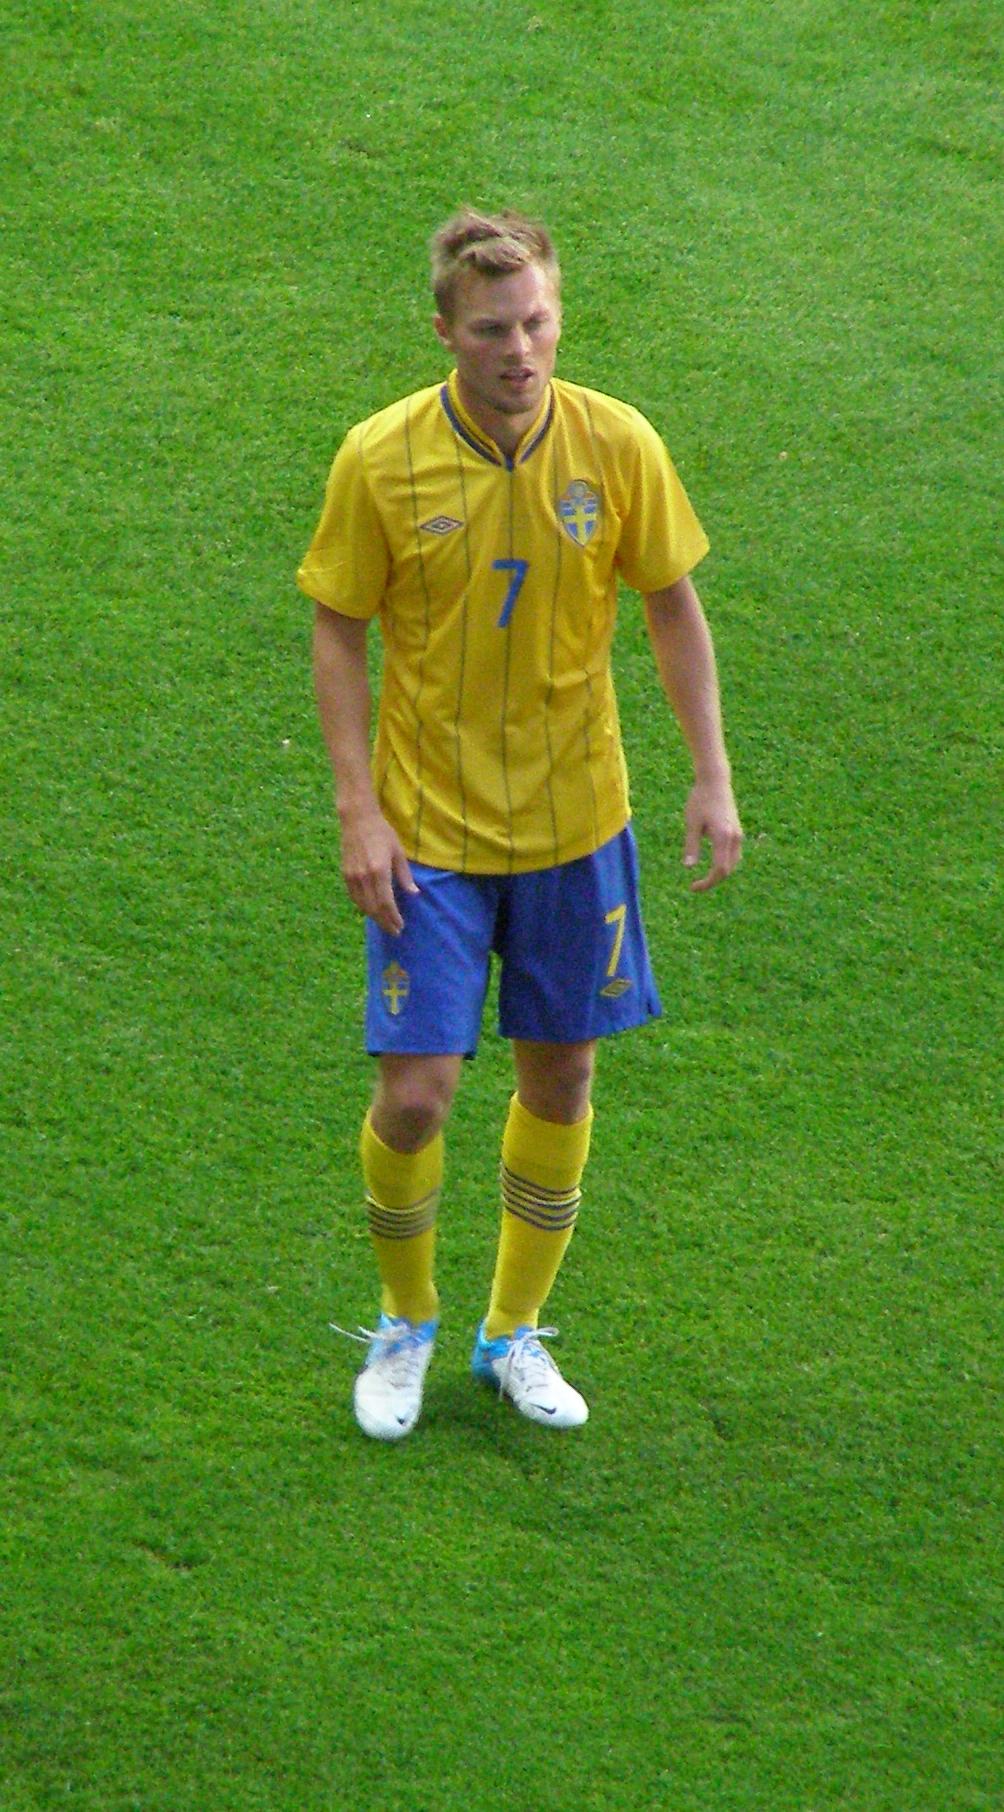 Handbal: Scoruri live IFK Ystads, rezultate și program meciuri